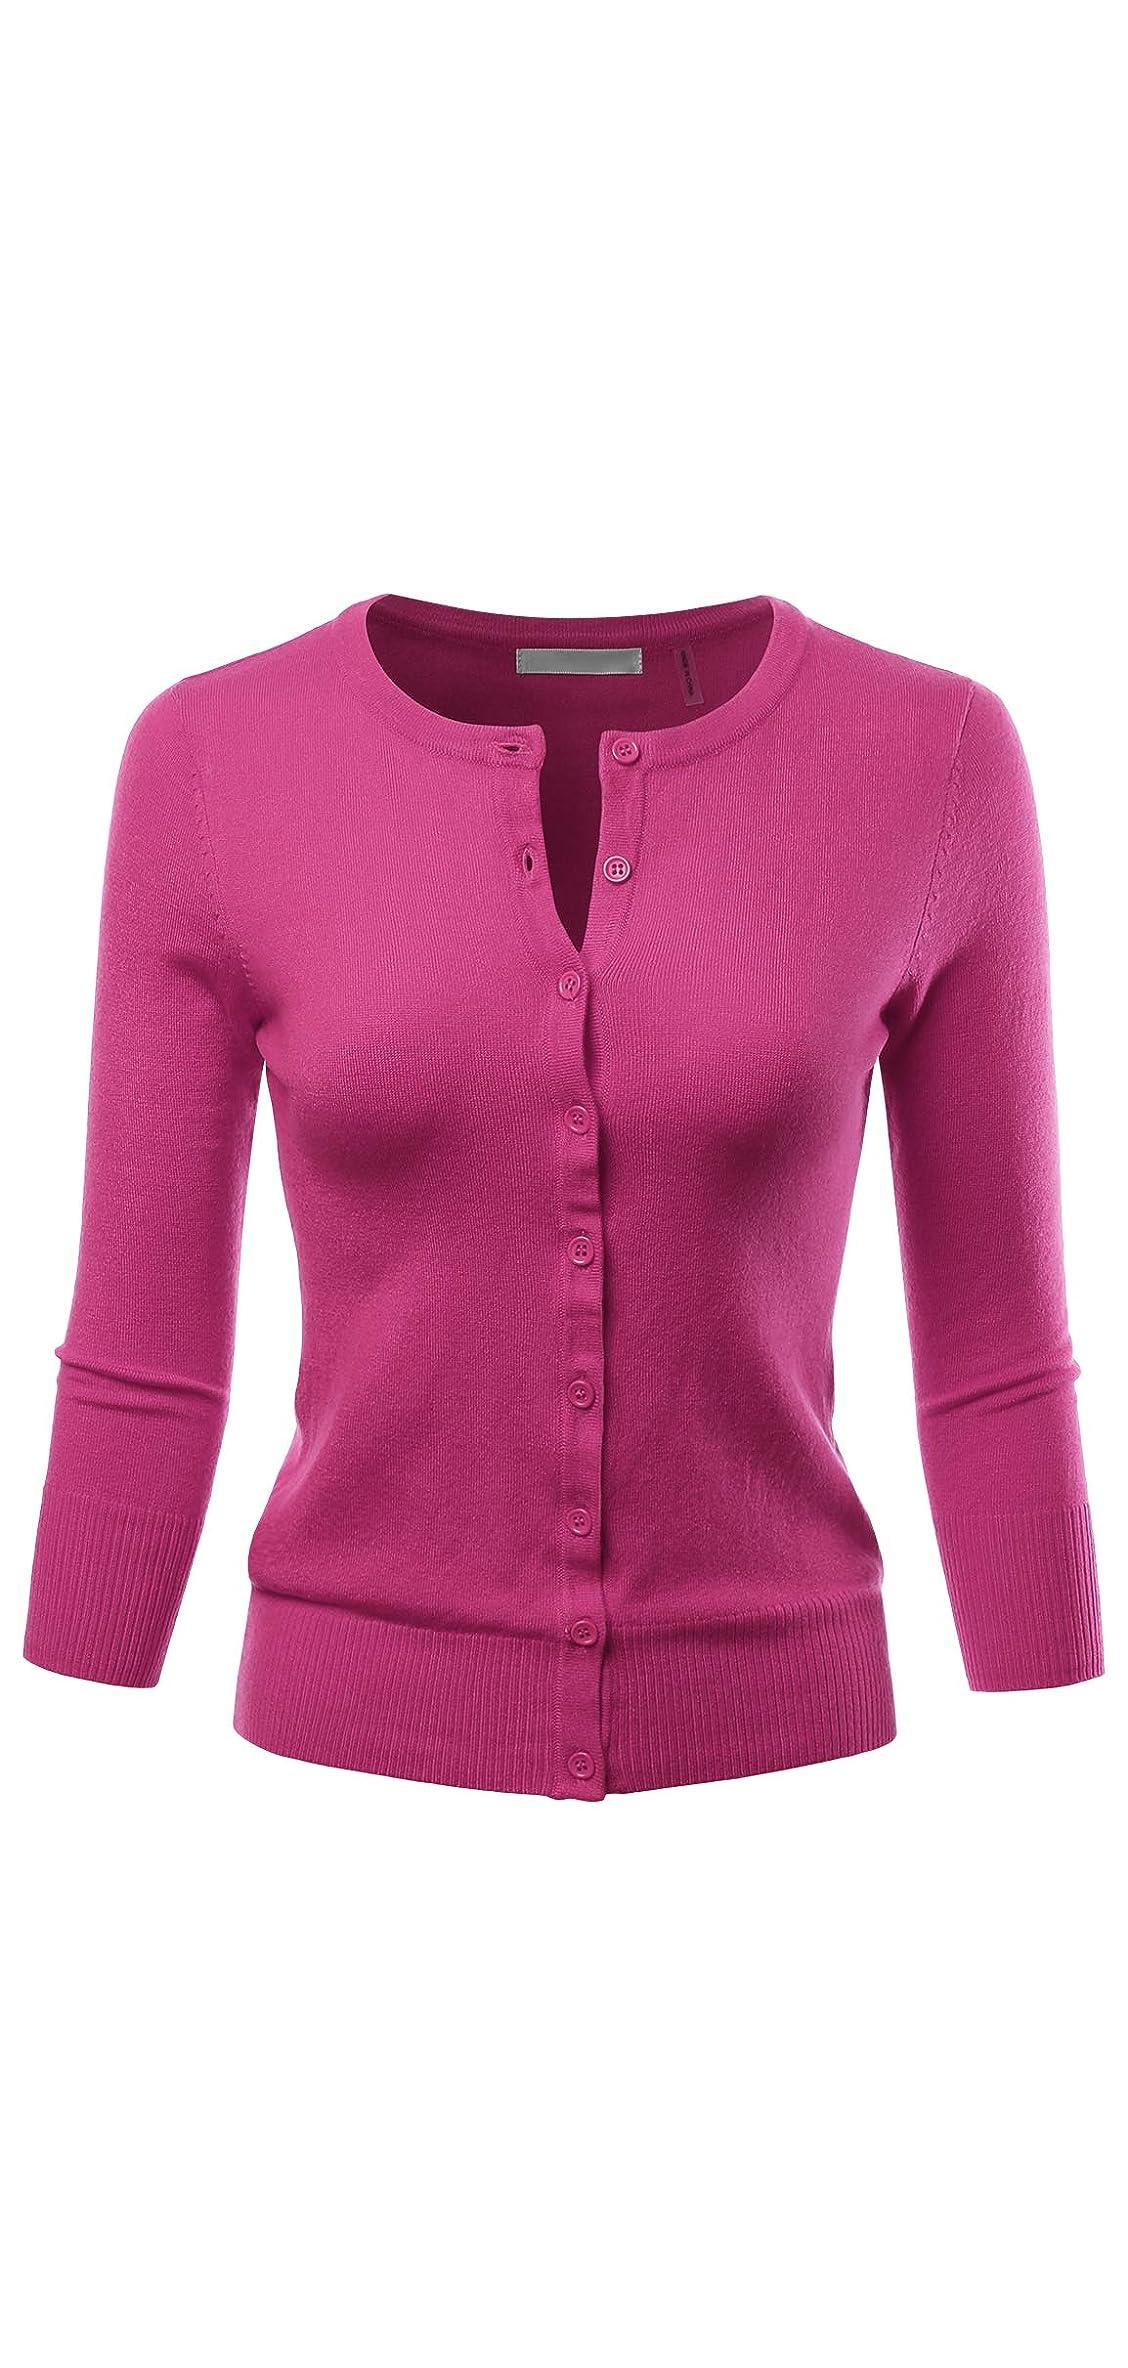 Women's / Sleeve Crewneck Button Down Knit Sweater